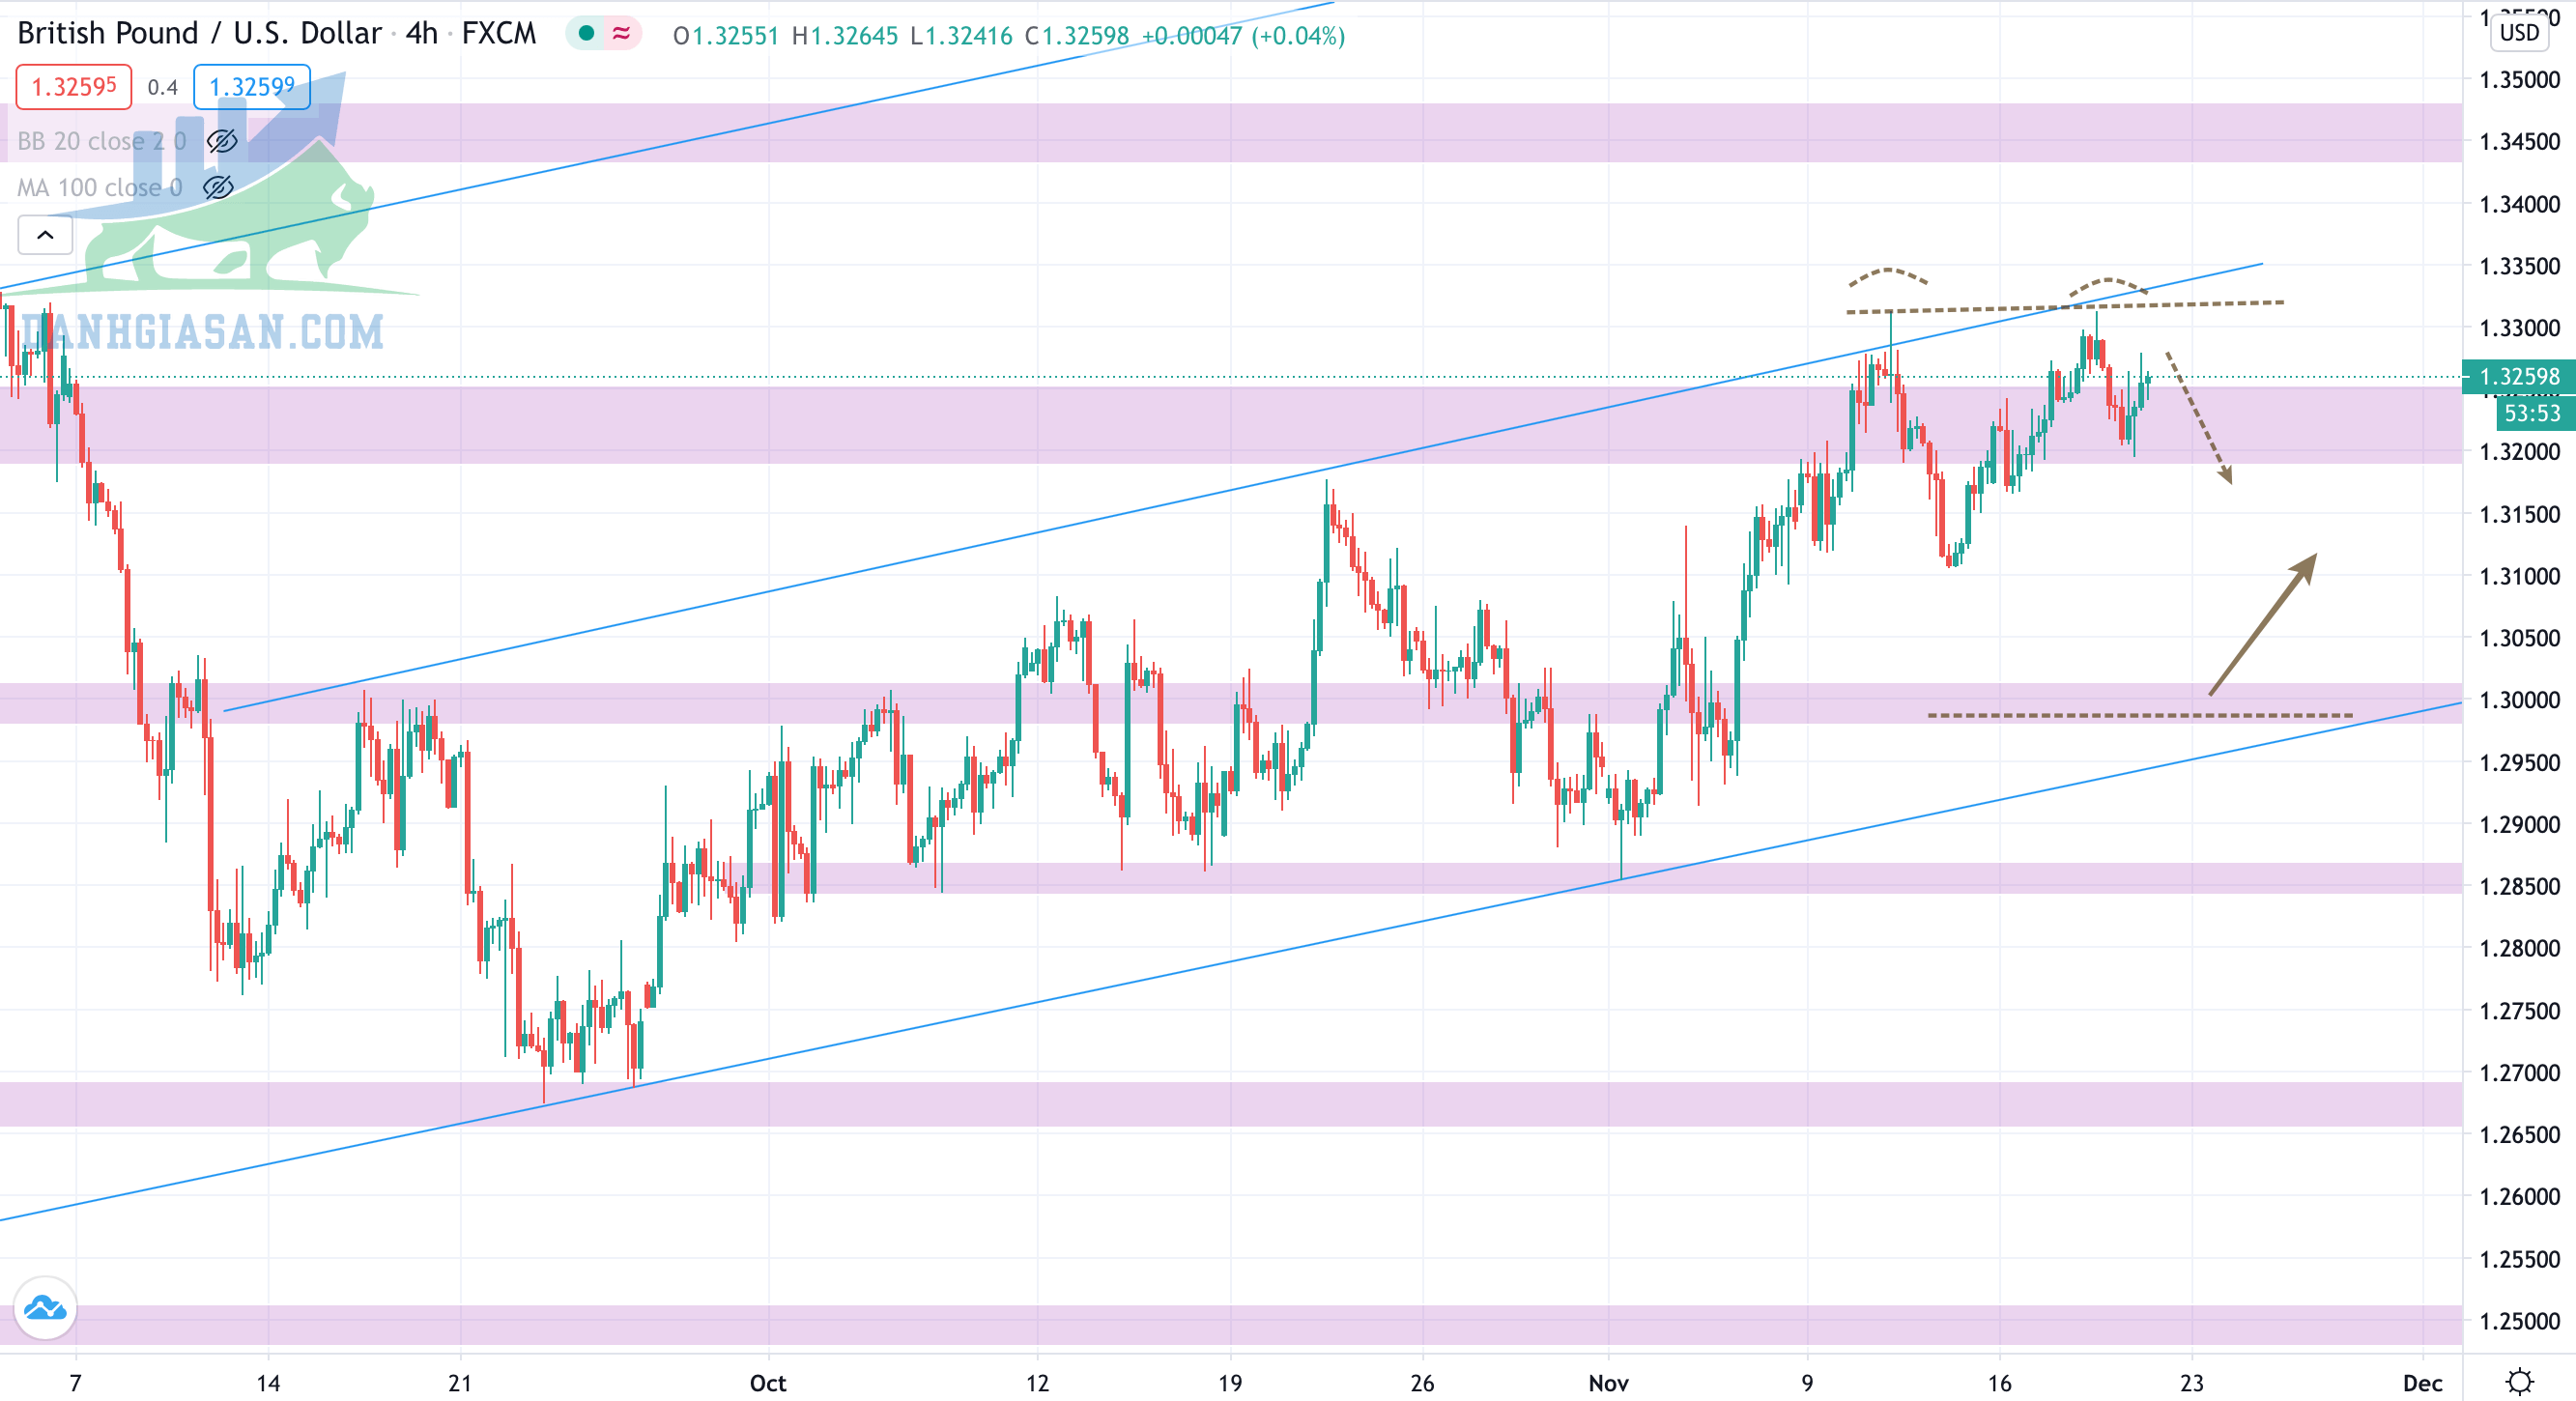 Phân tích Forex - cặp GBP/USD